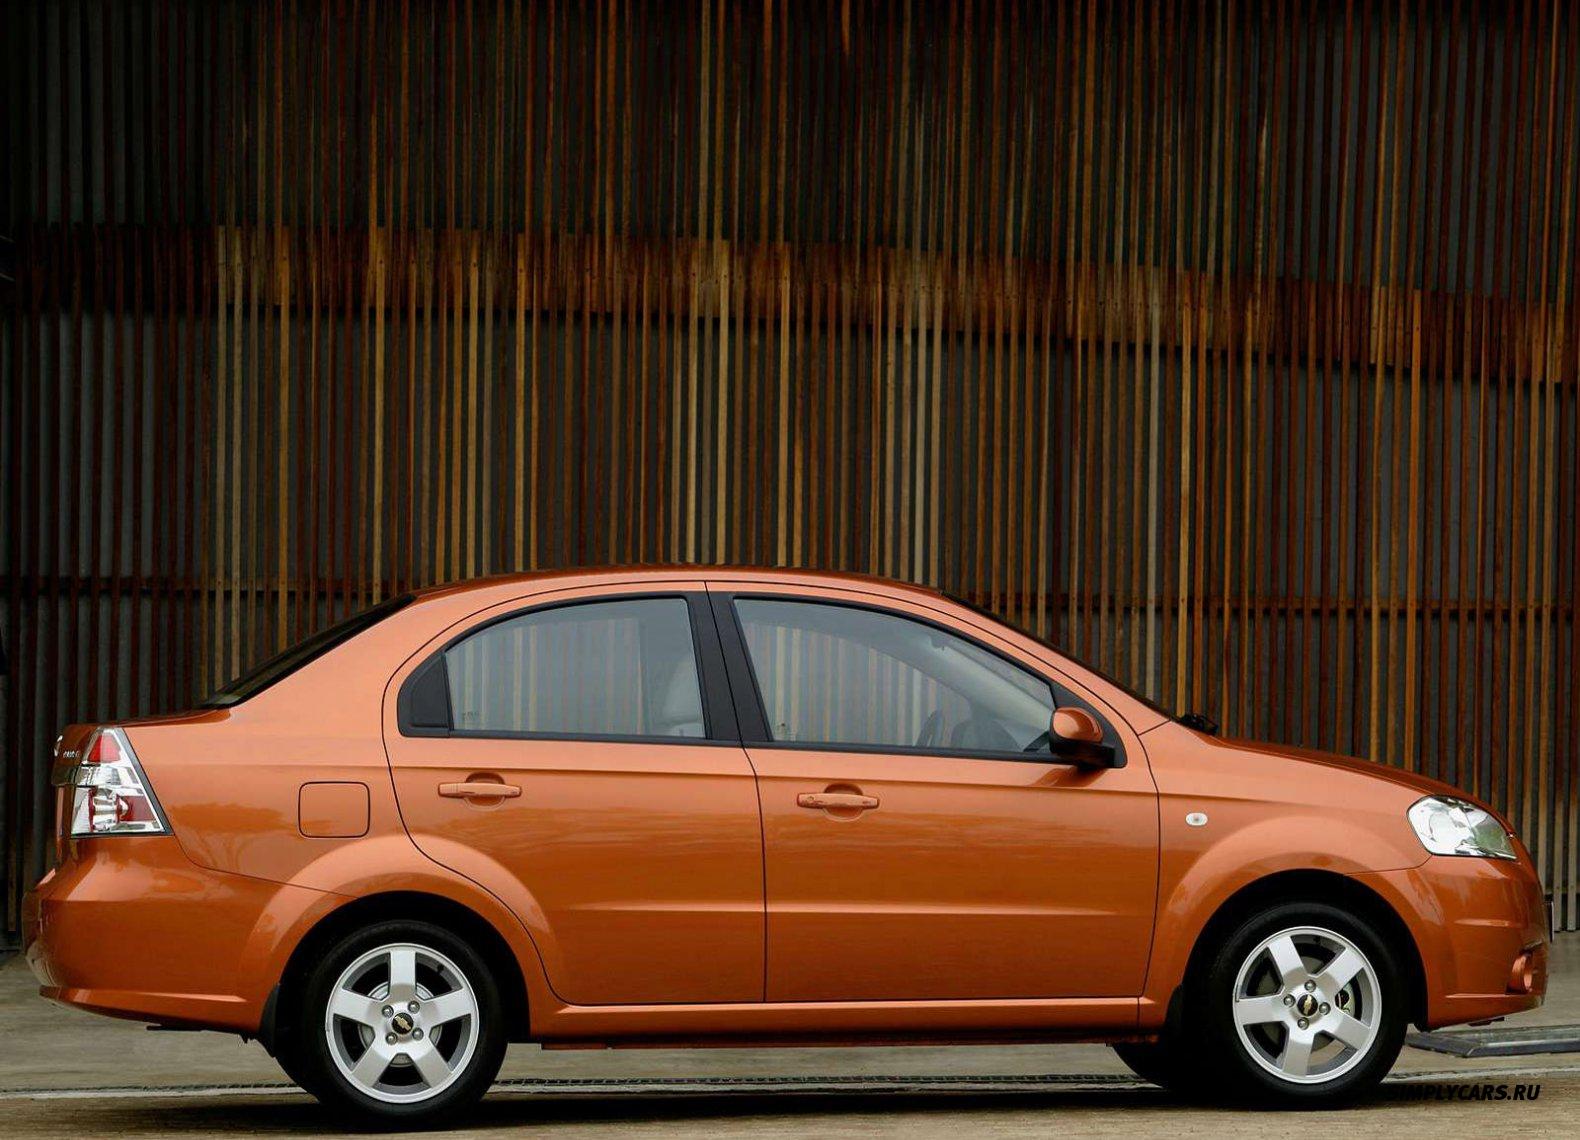 Камера заднего вида Chevrolet Aveo Седан T200/T250